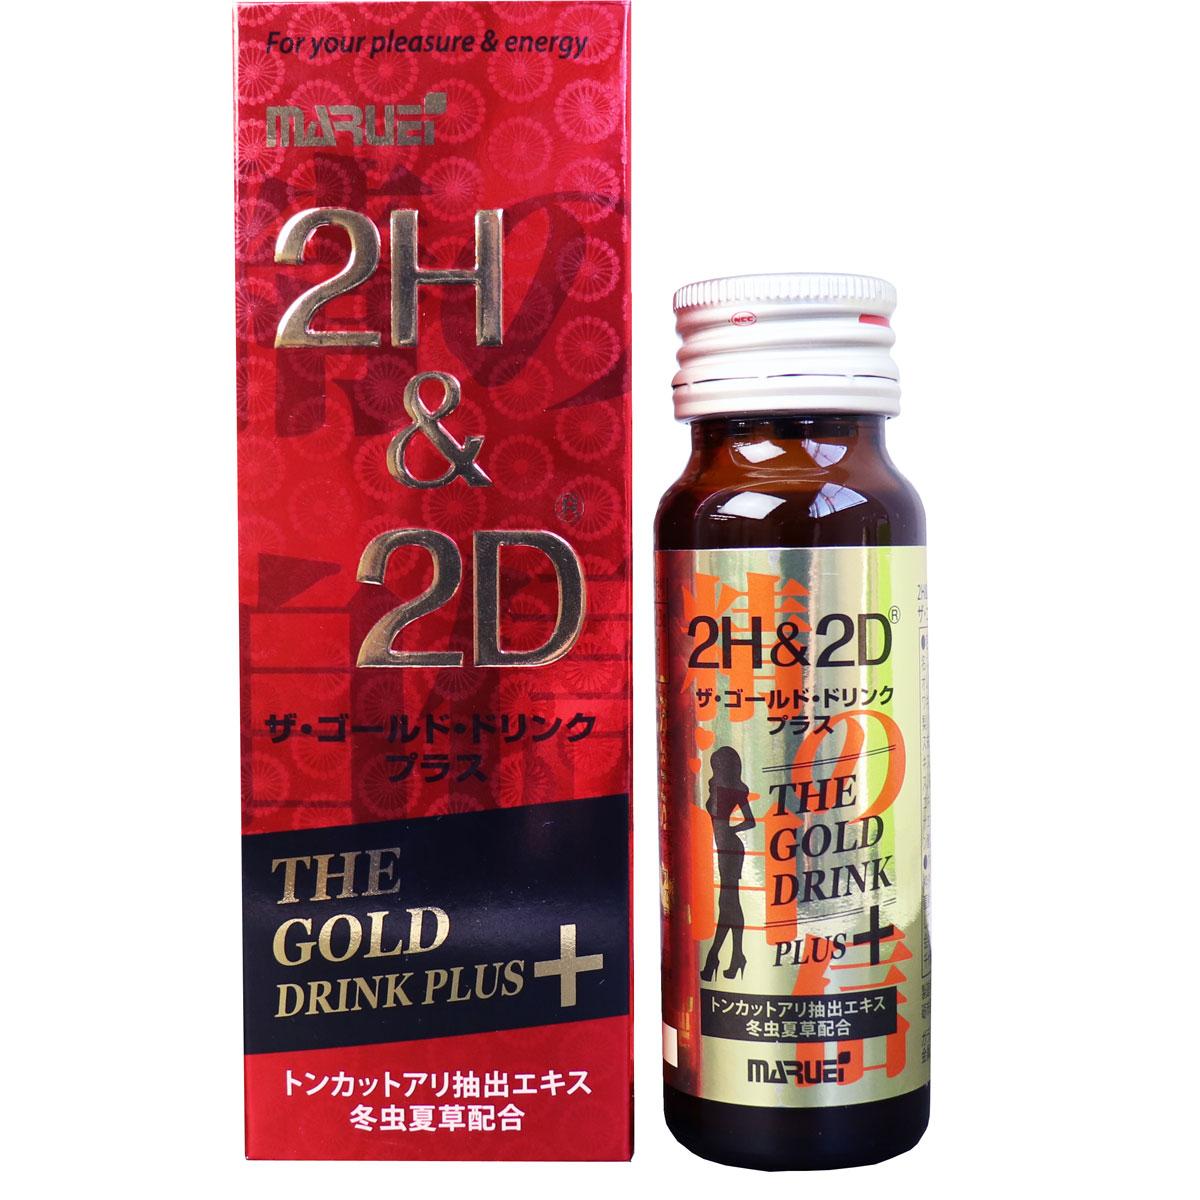 ※2H&2D ザ・ゴールド・ドリンク プラス 50mL